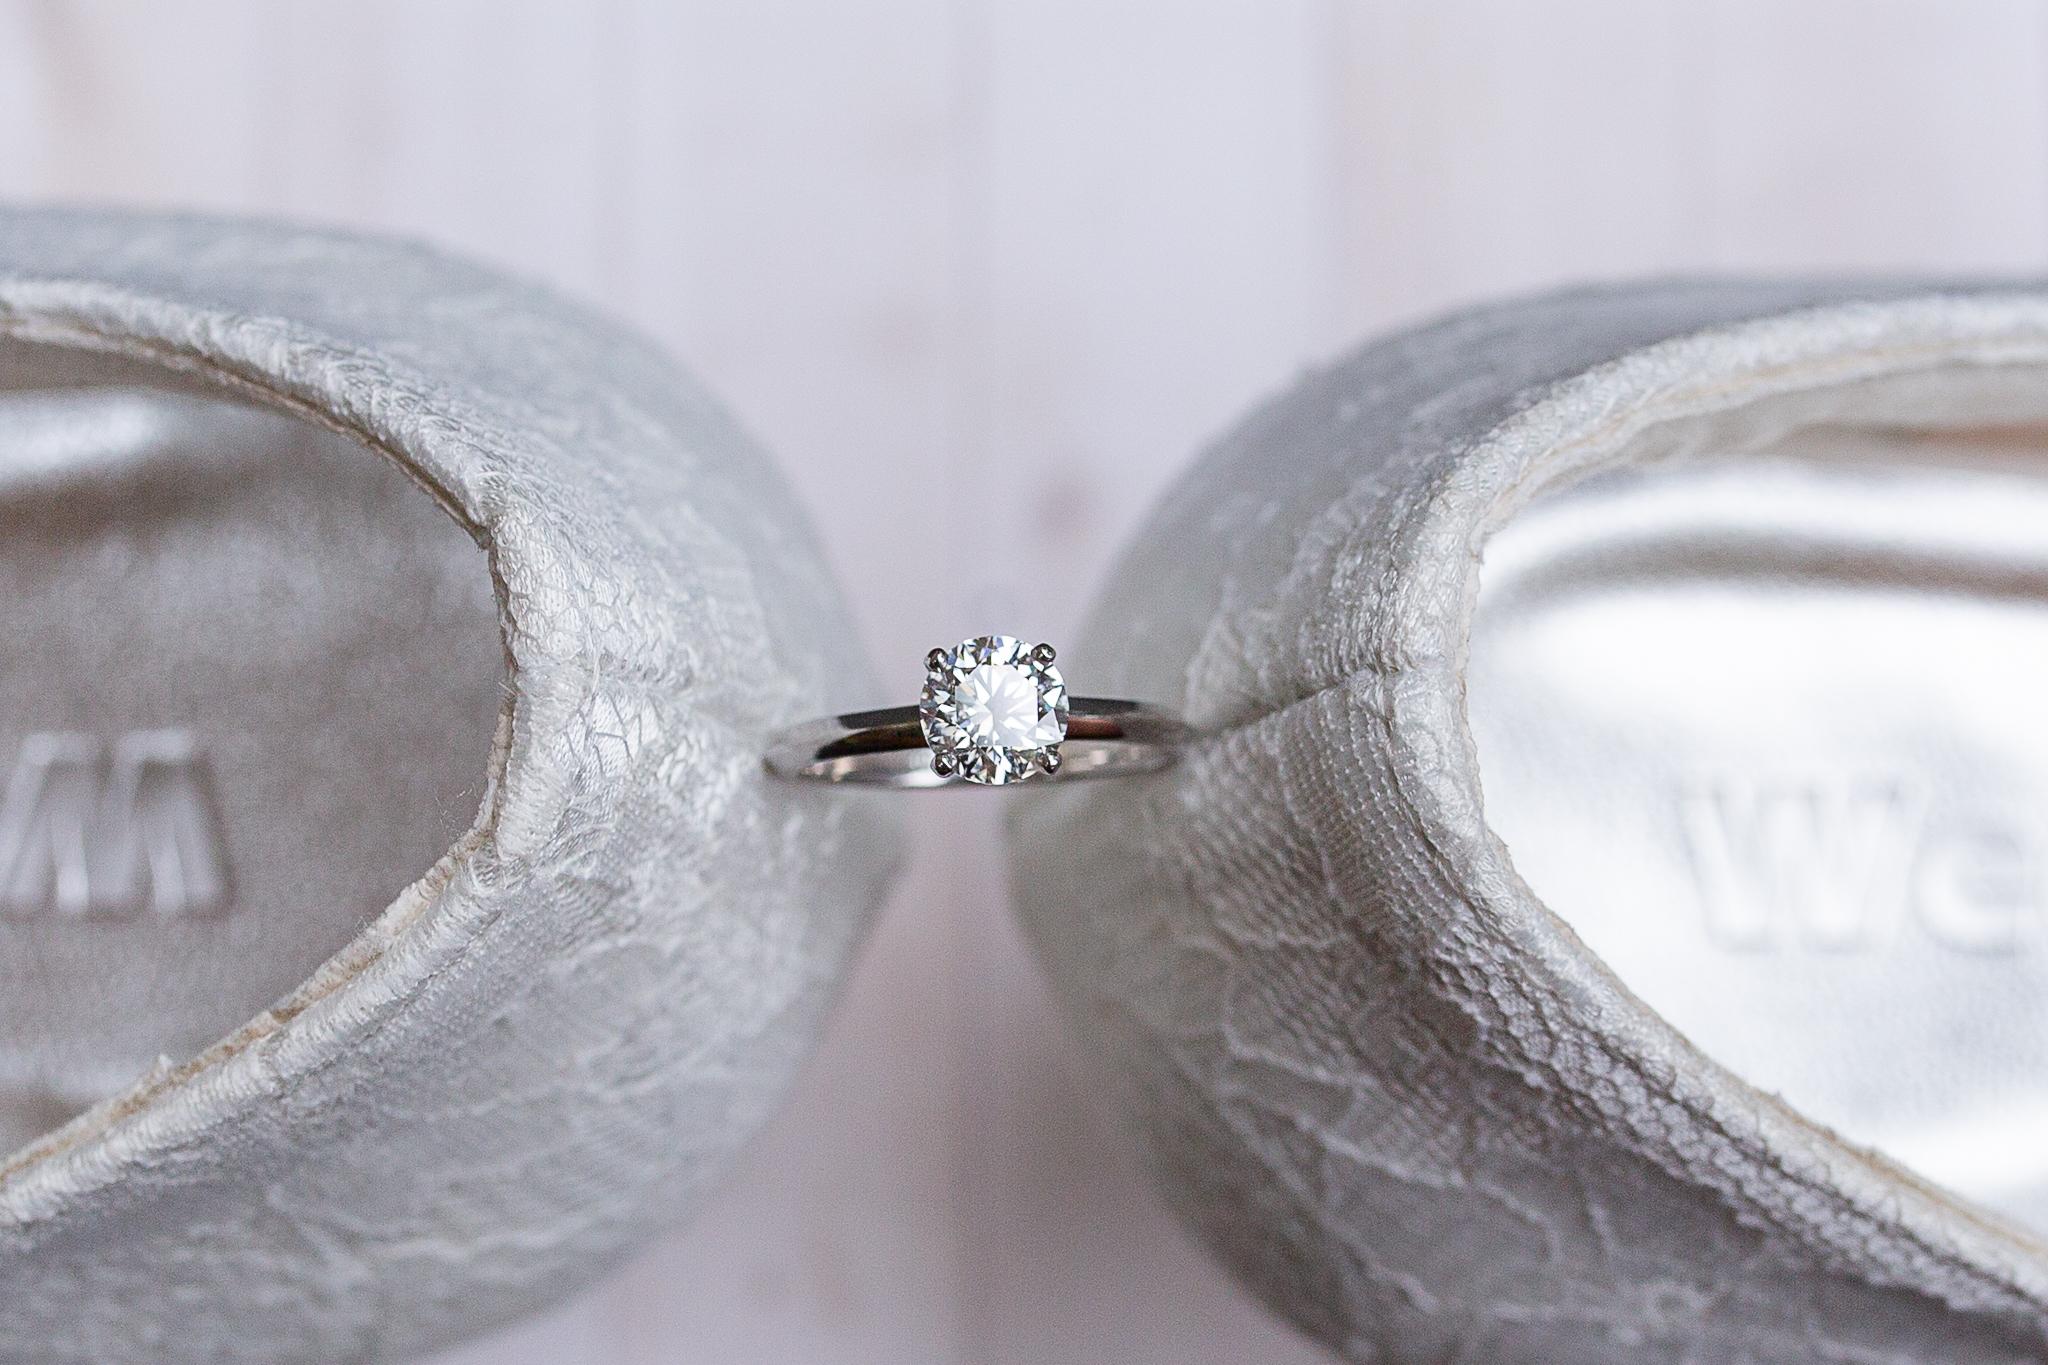 detail shot of wedding ring and brides heels